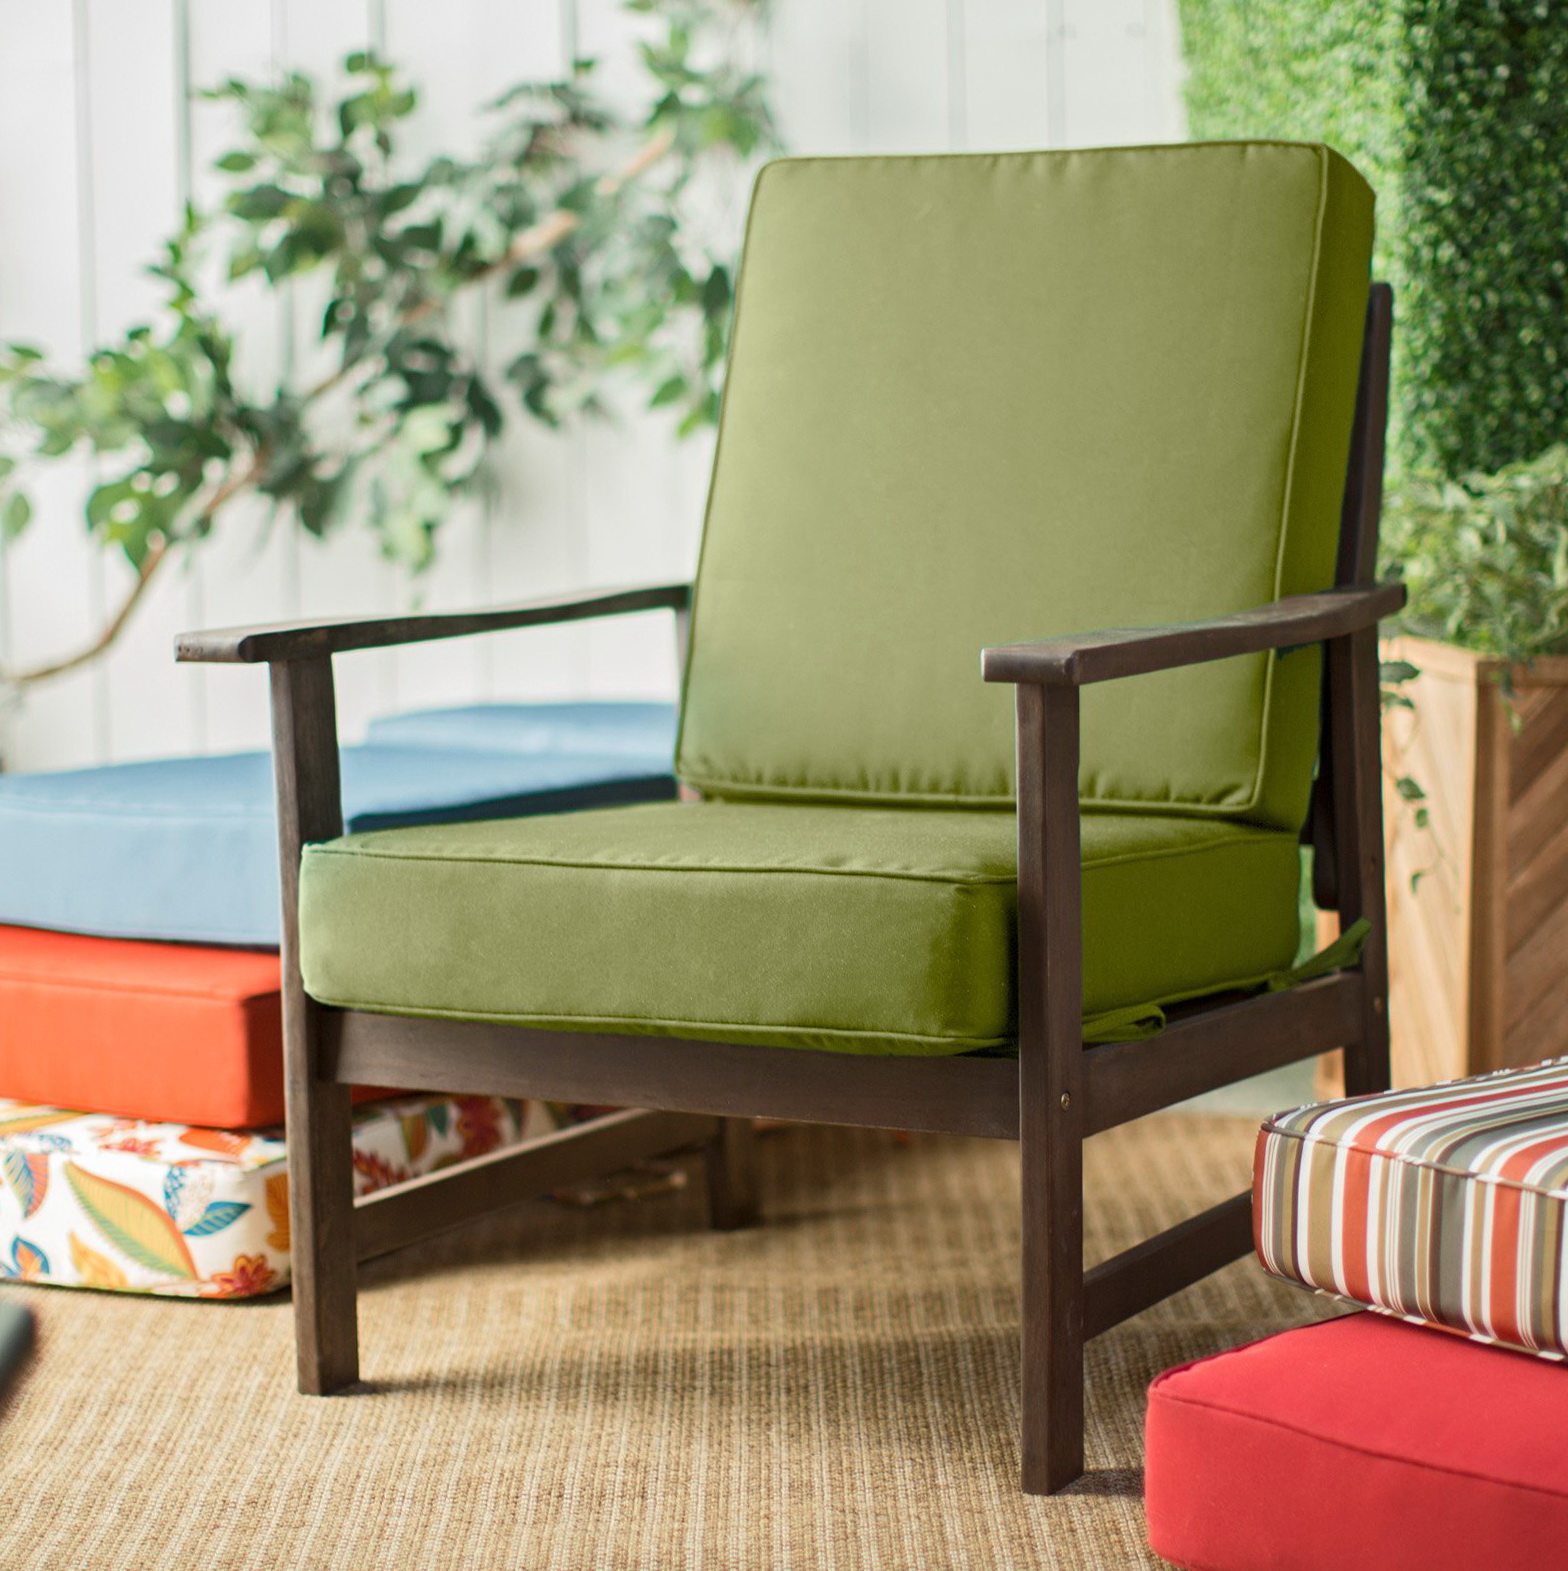 Walmart Outdoor Chair Cushions Clearance